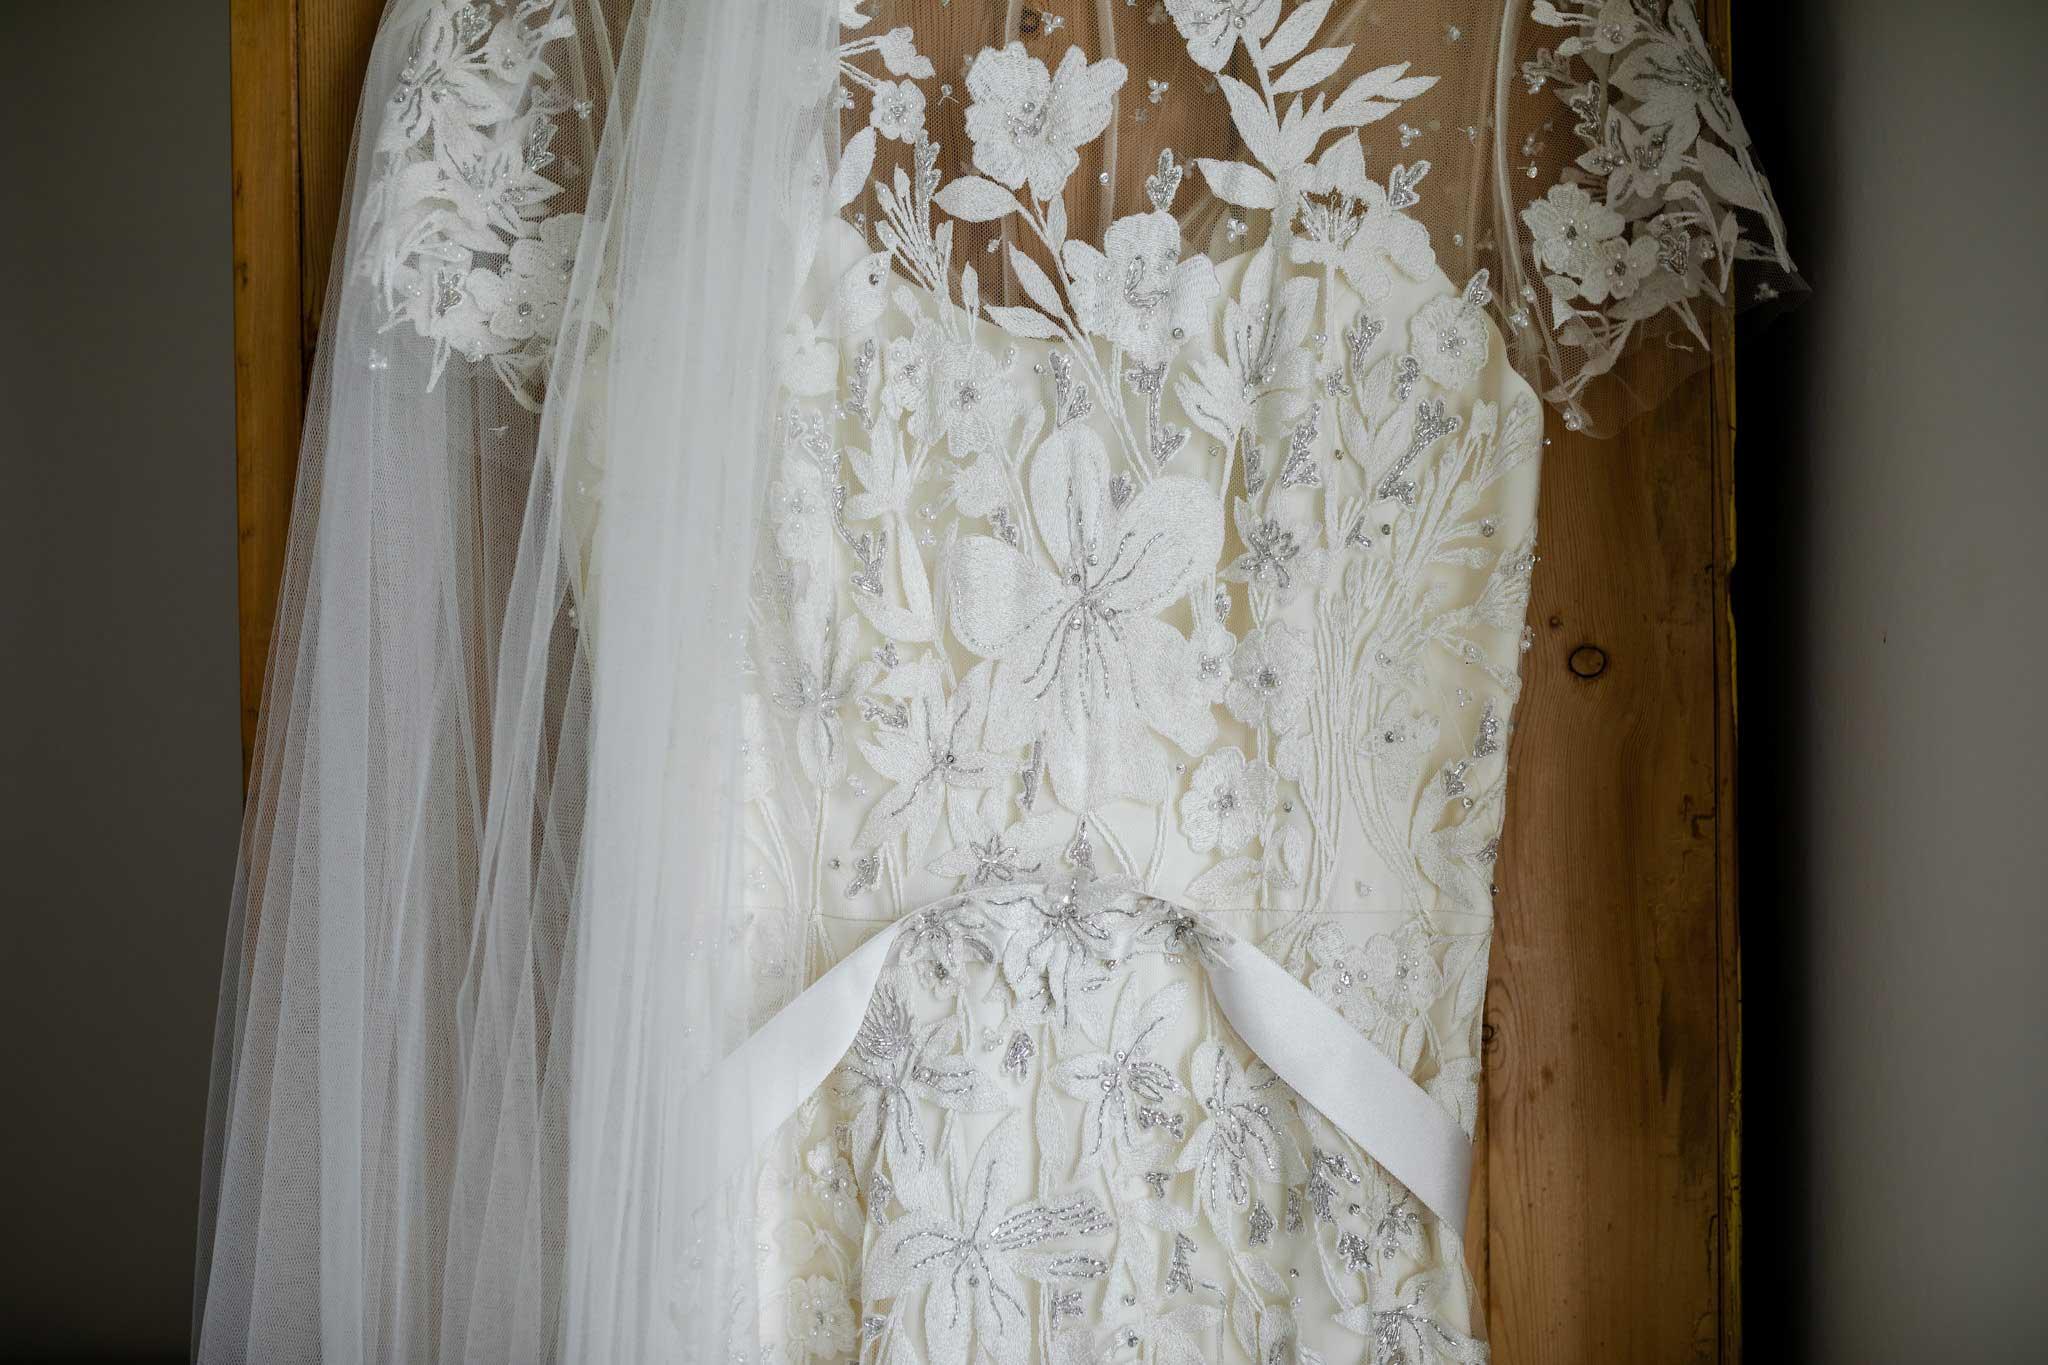 Jenny Packham lace wedding dress